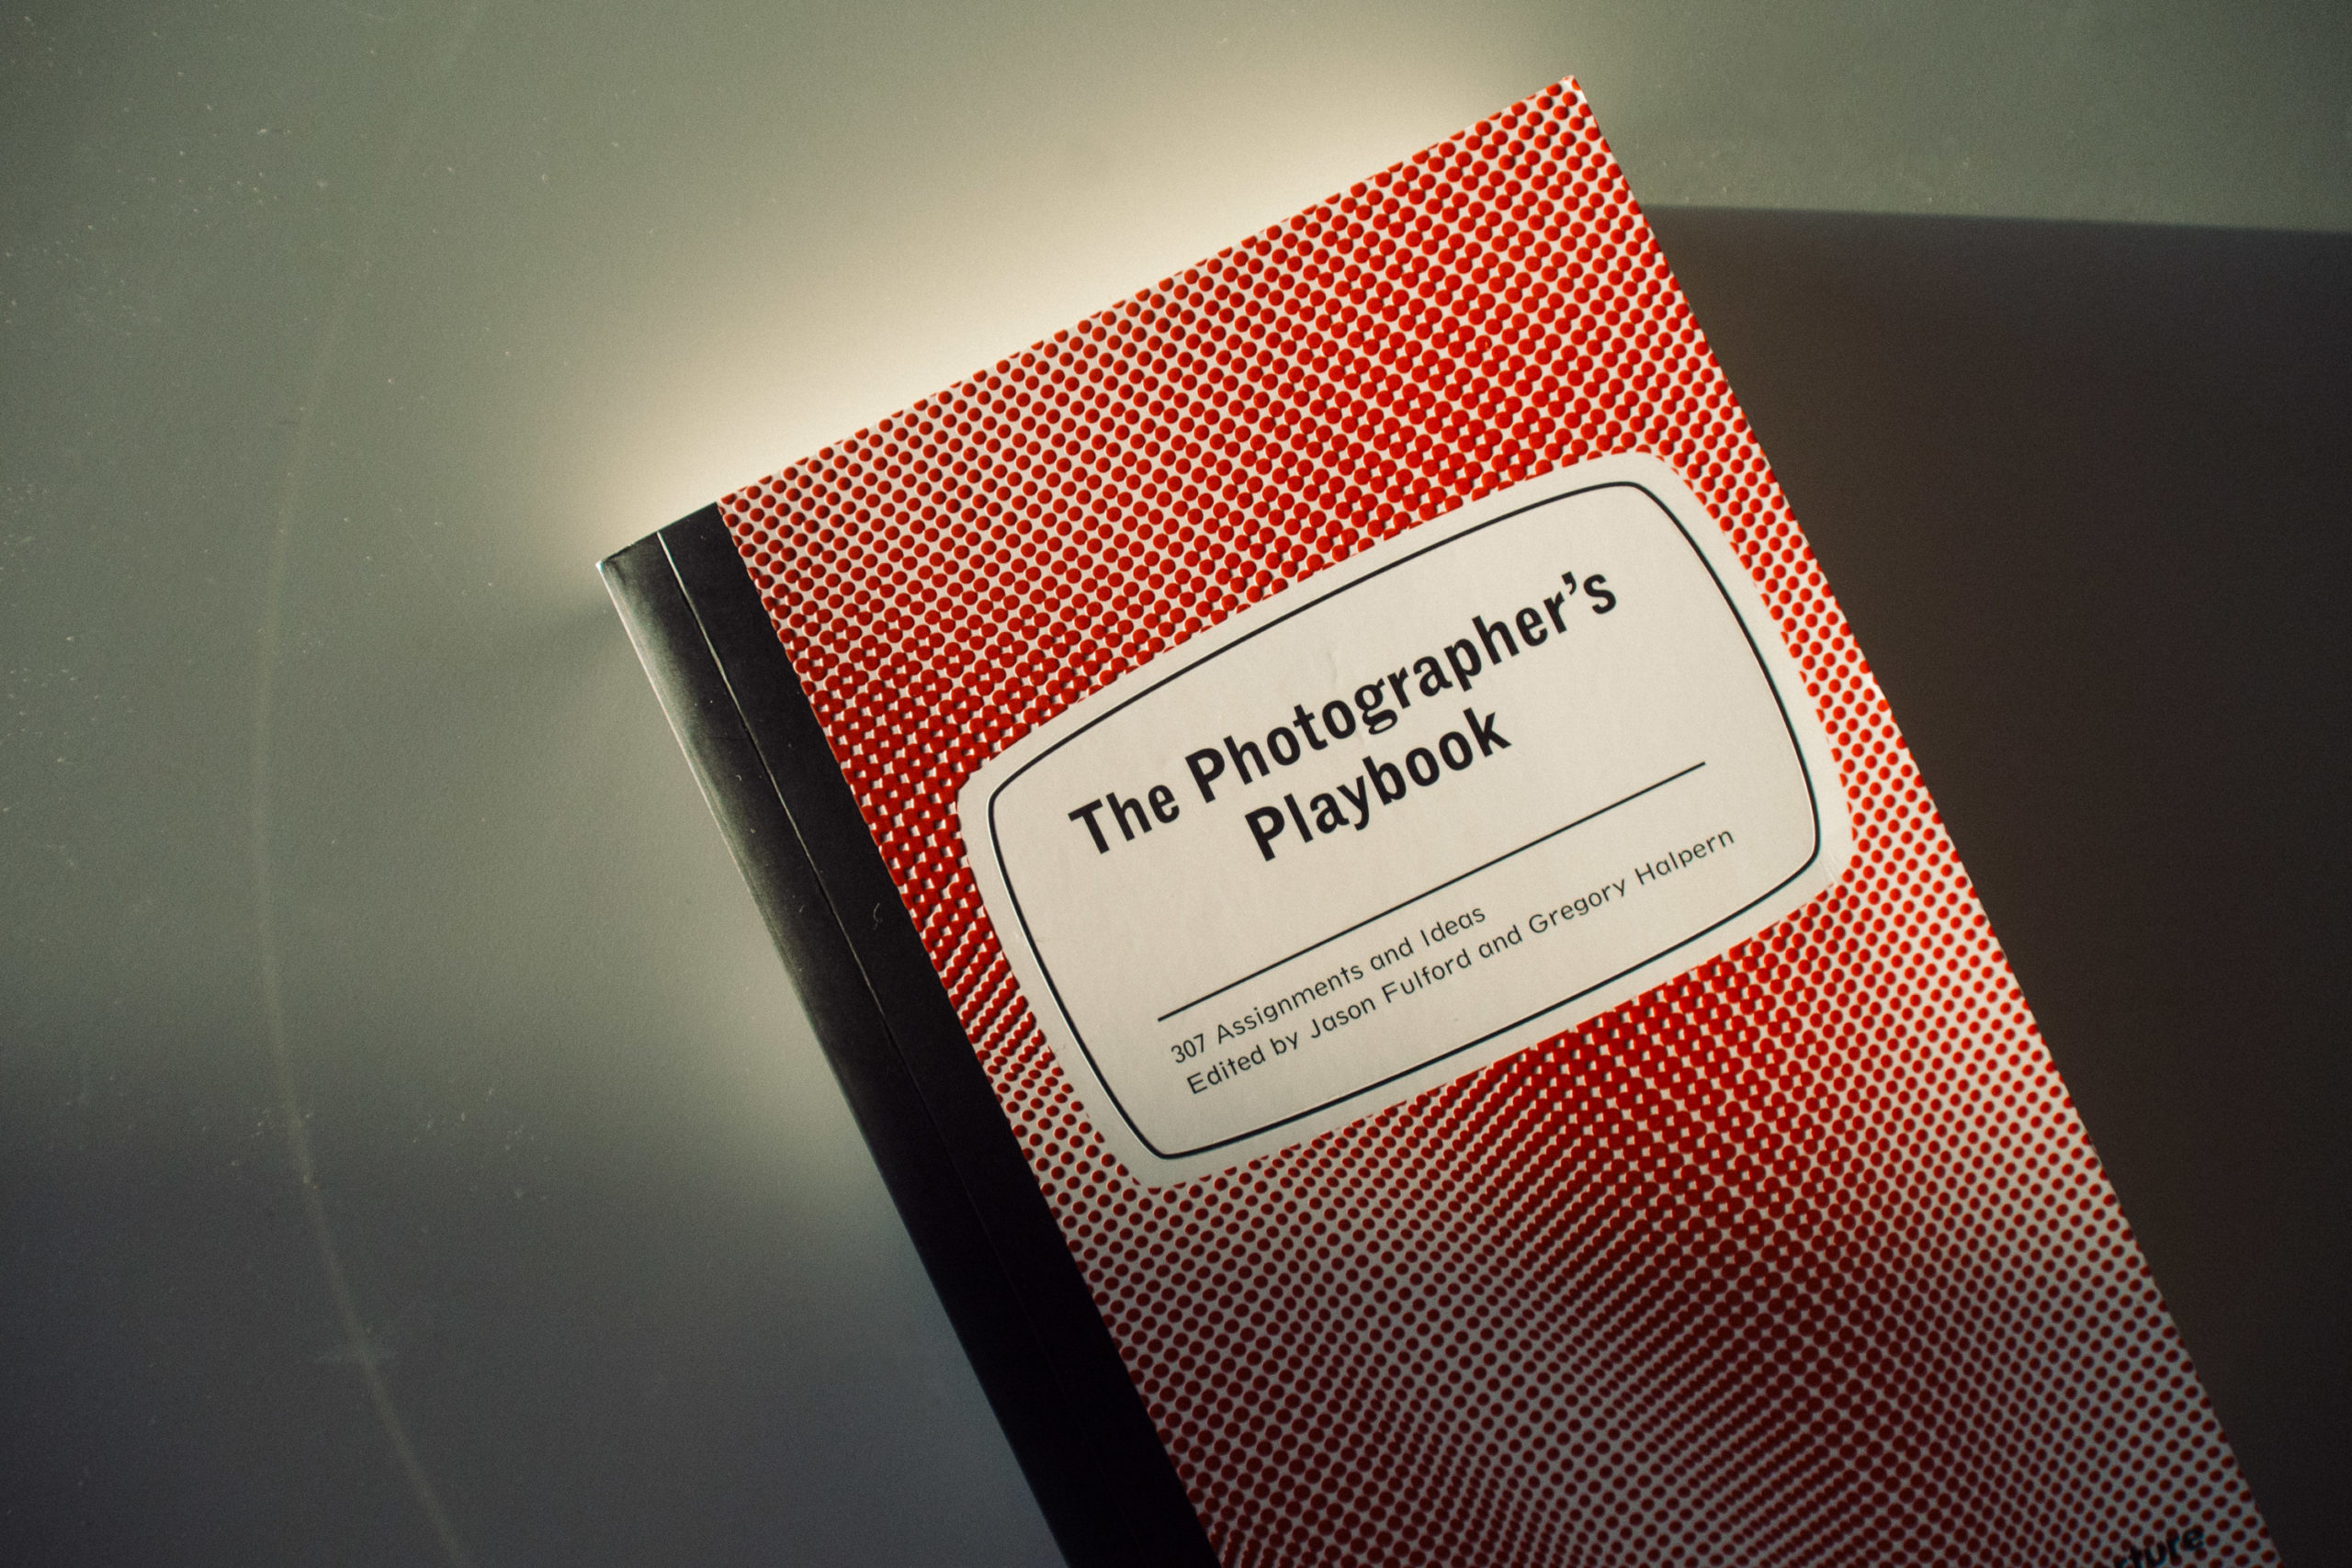 A photographer's playbook